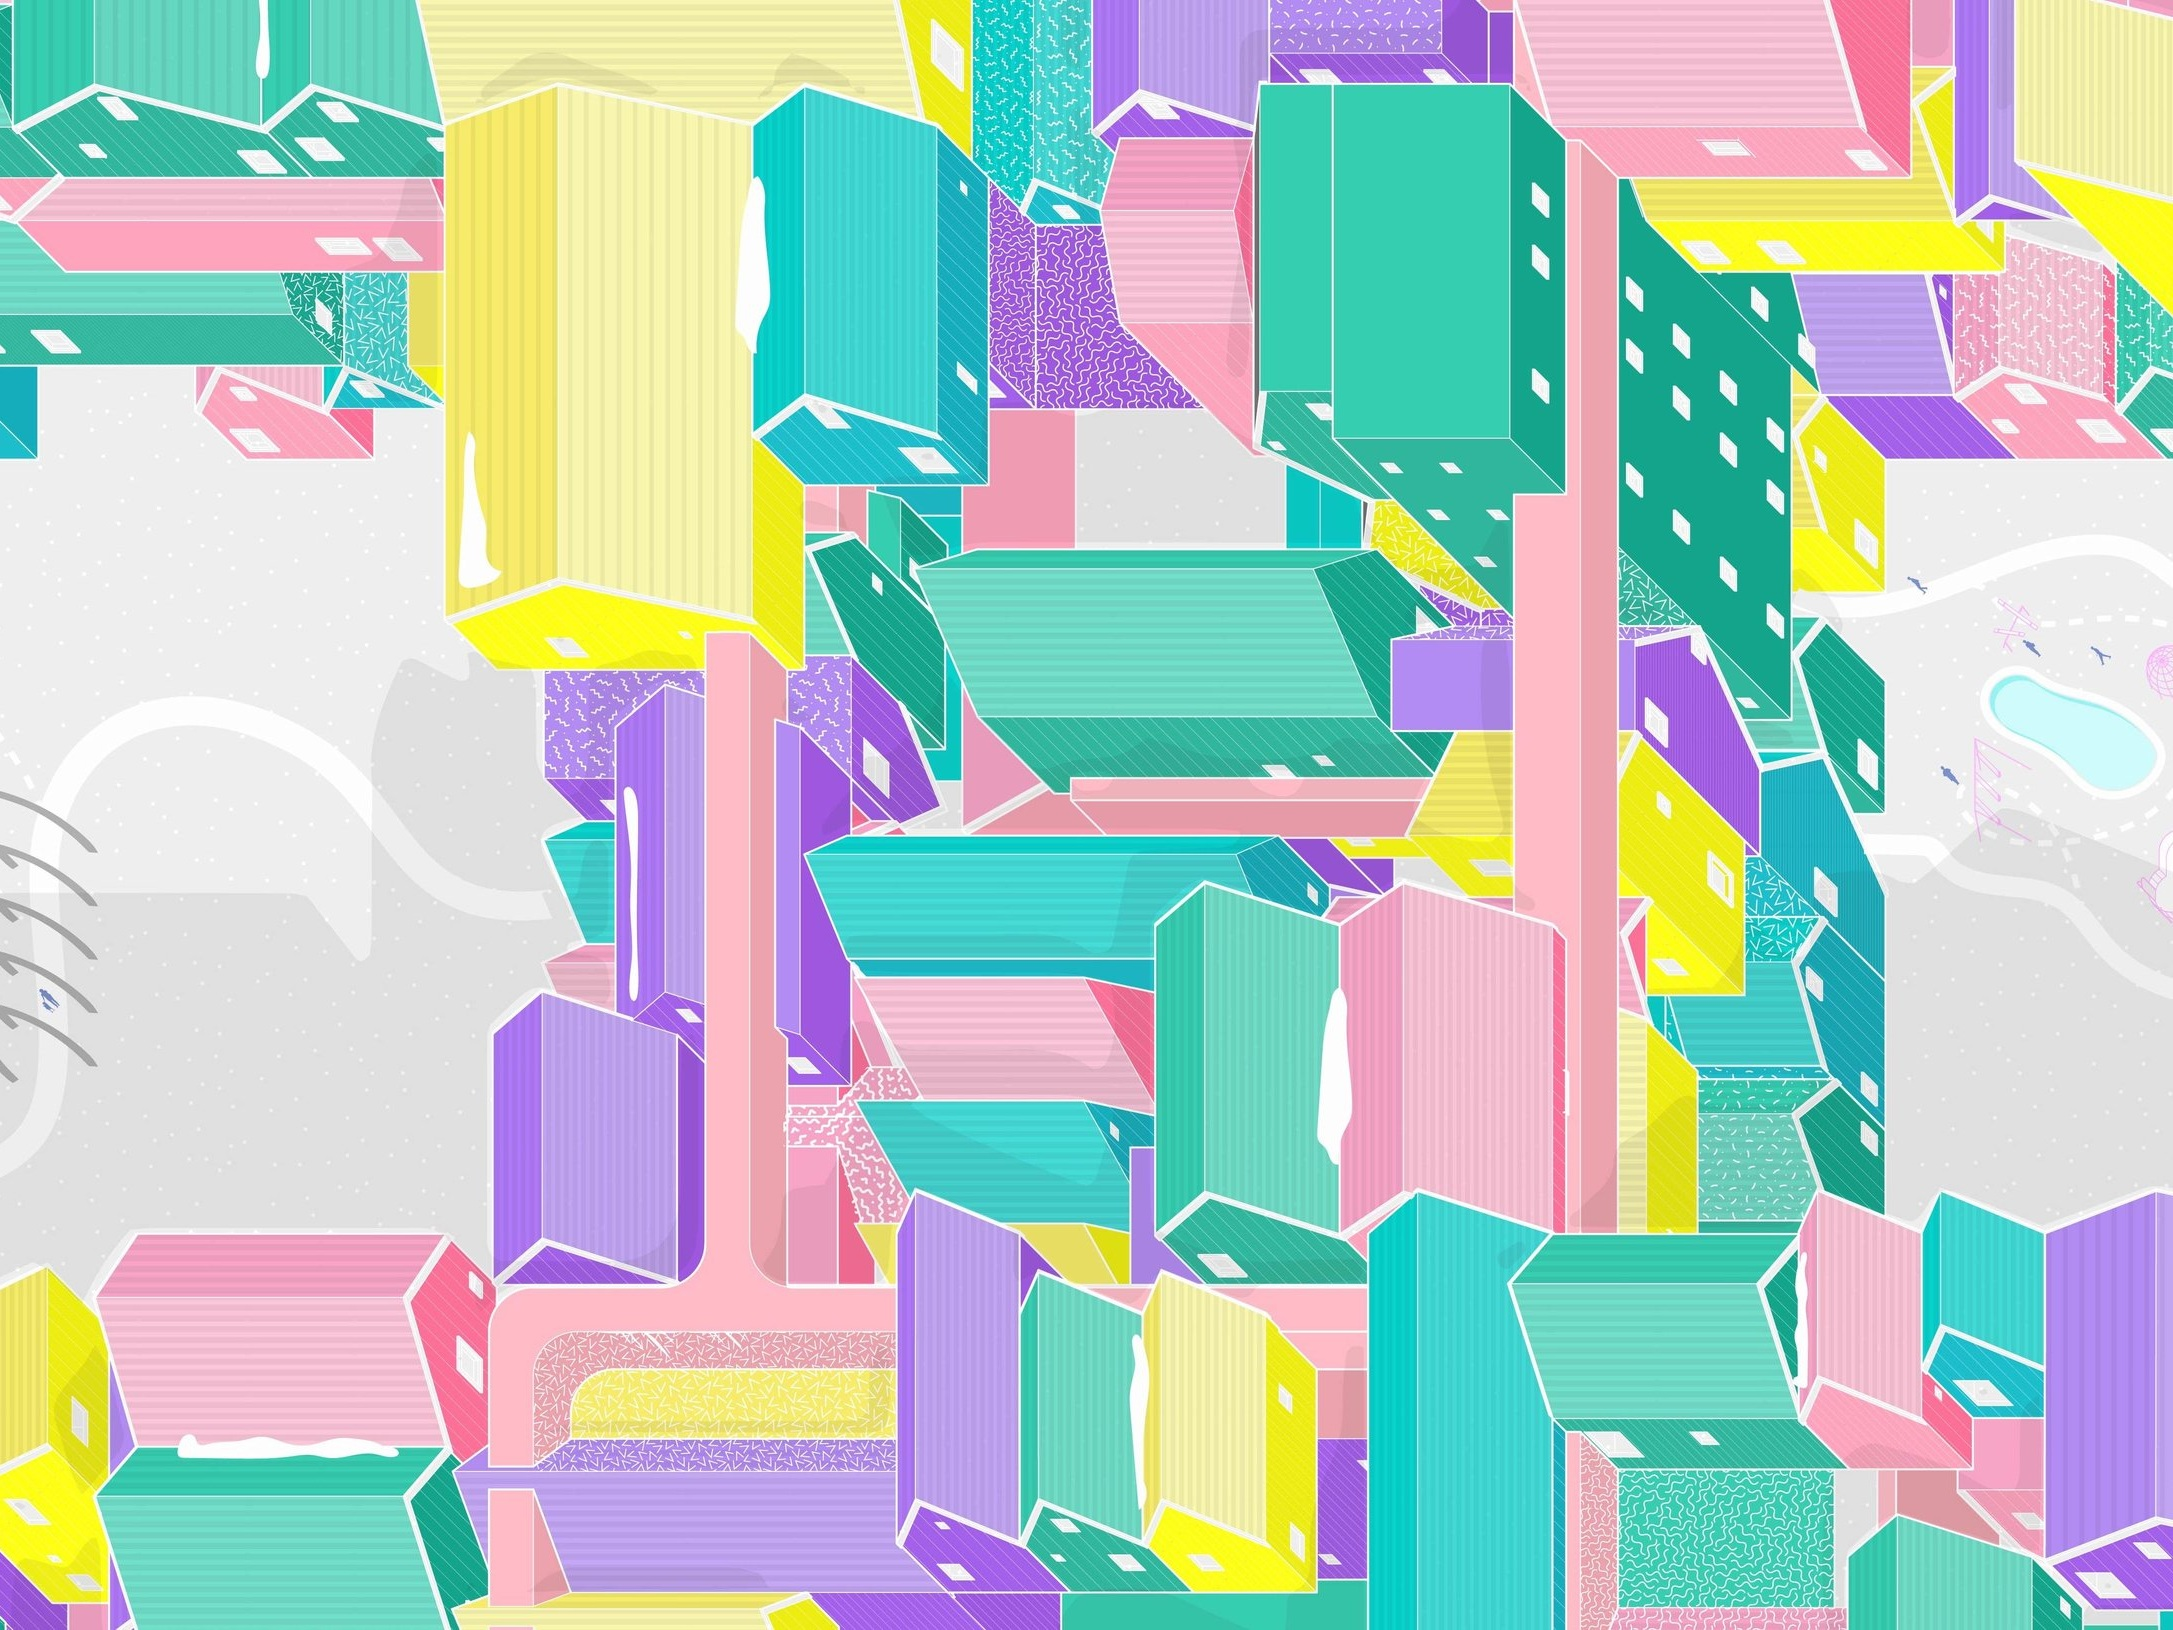 Plan Oblique_Enlarged 3.jpg